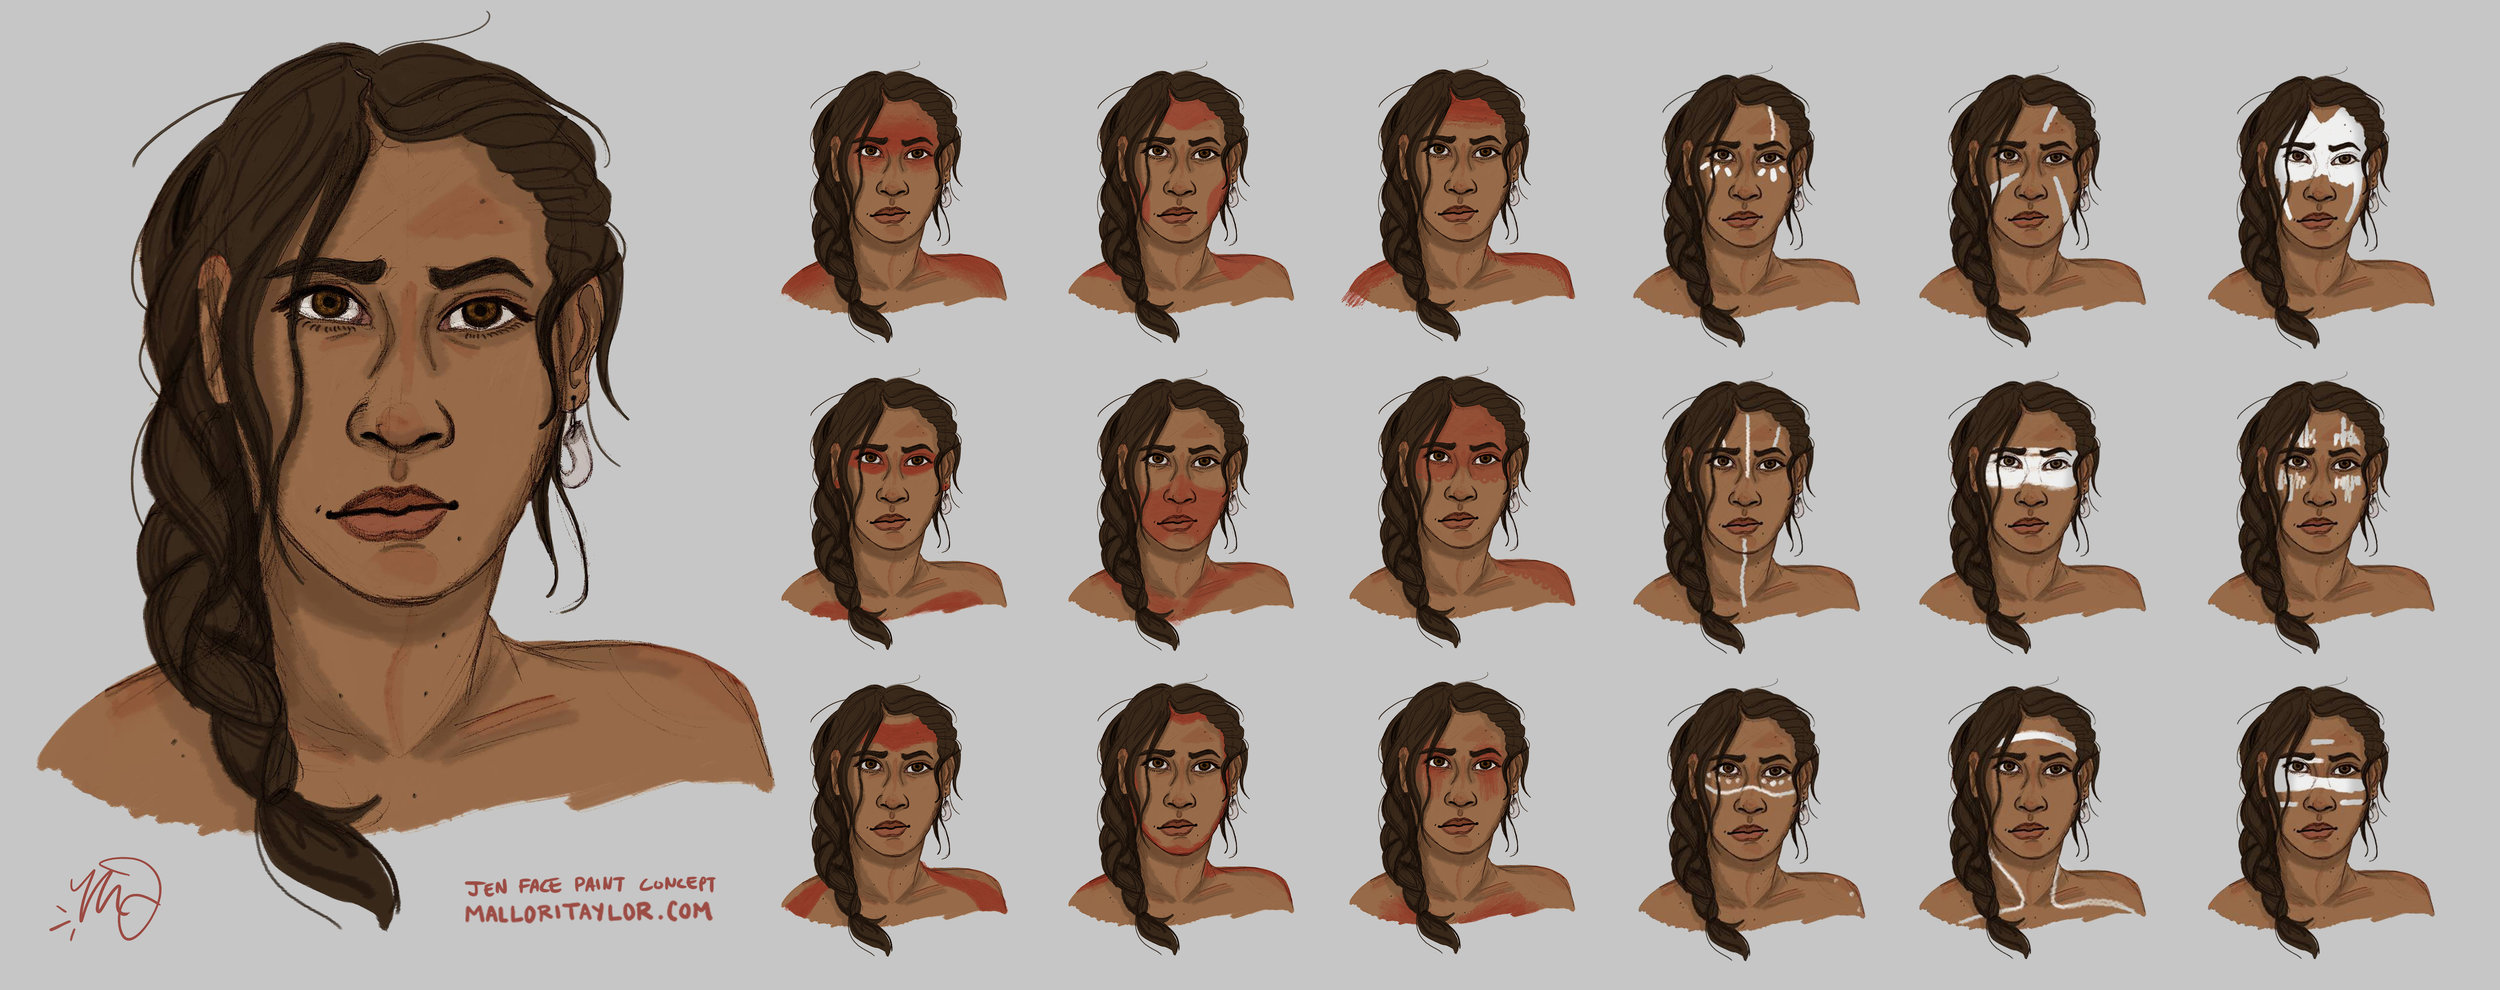 17-3-16 Jen facepaint assem2.jpg